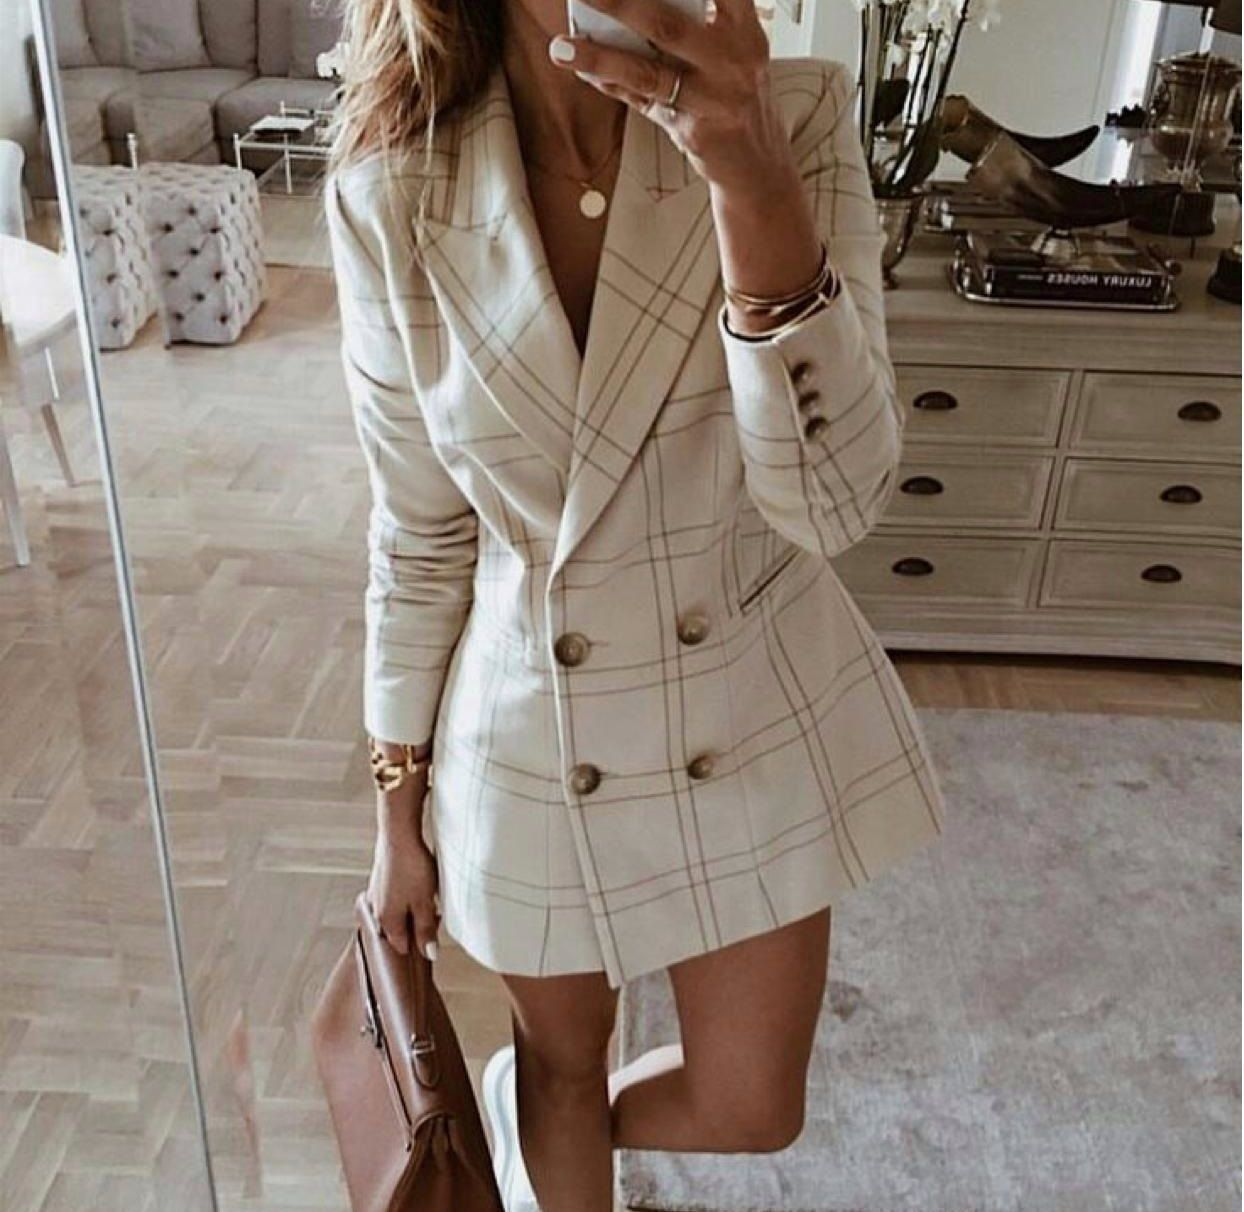 Model 23801 179 90 Ceket Elbise Beden S M L Kumas Atlas Urun Boyu Renk Tas Kargo Blazer Elbise Sokak Stili Stil Kiyafetler